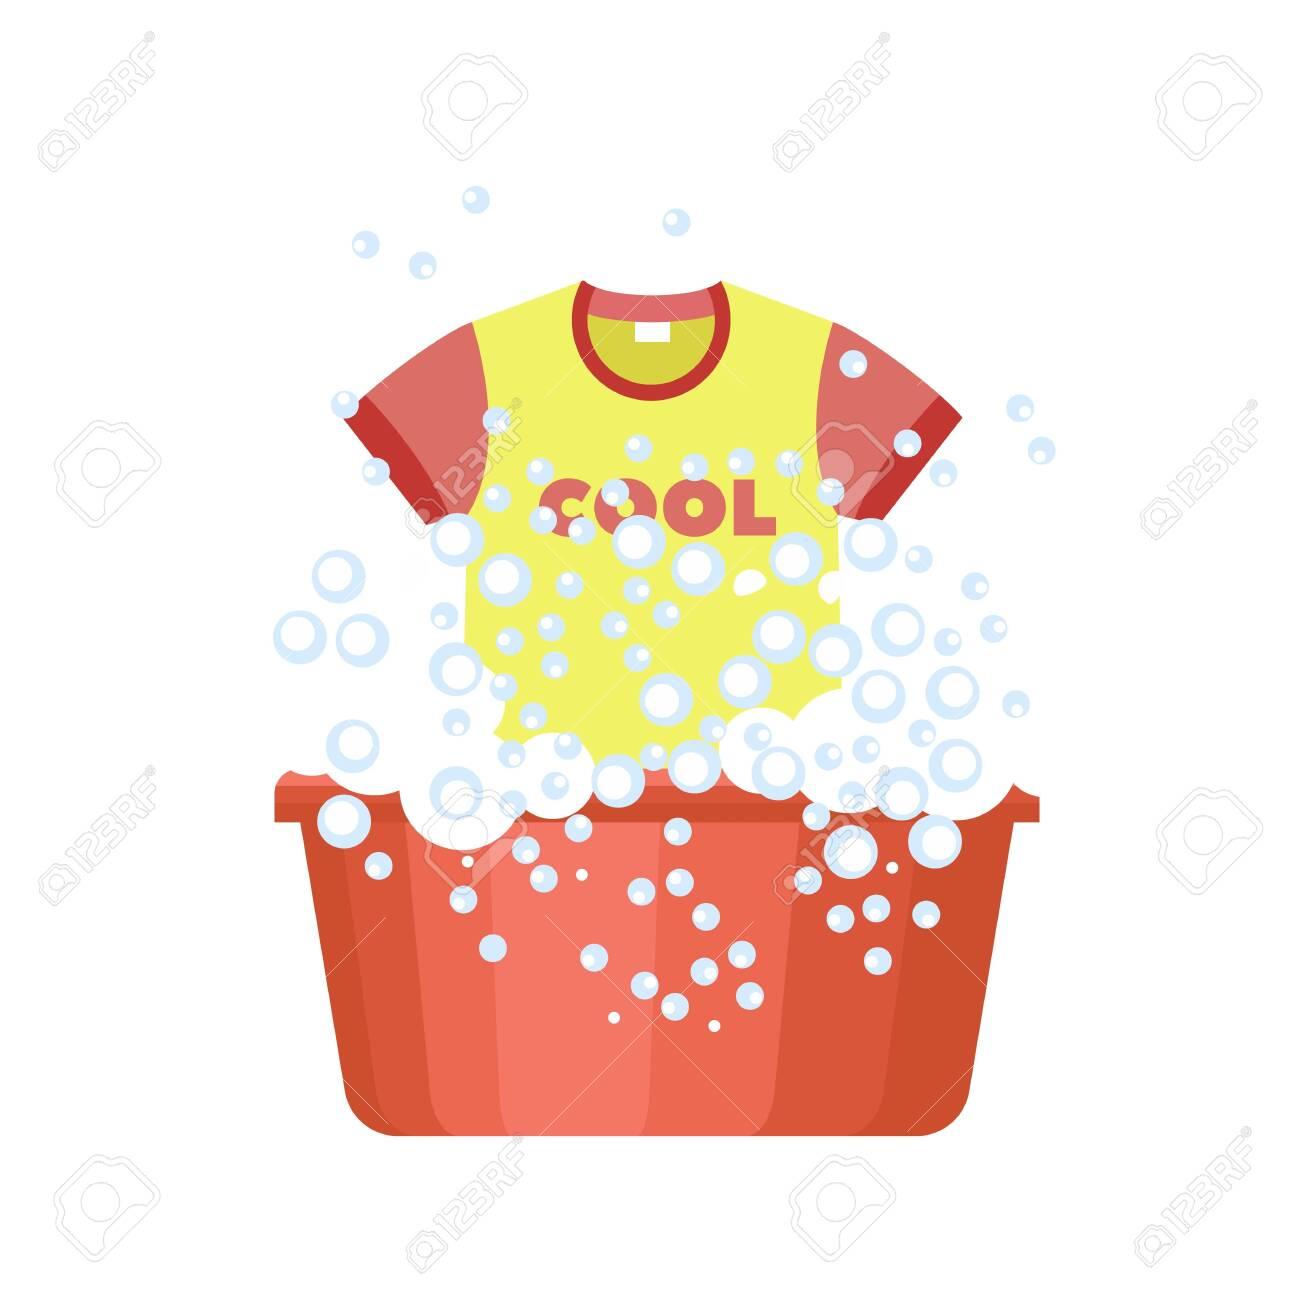 Tshirt wash plastic basin icon. Flat illustration of tshirt wash plastic basin vector icon for web design - 124444041